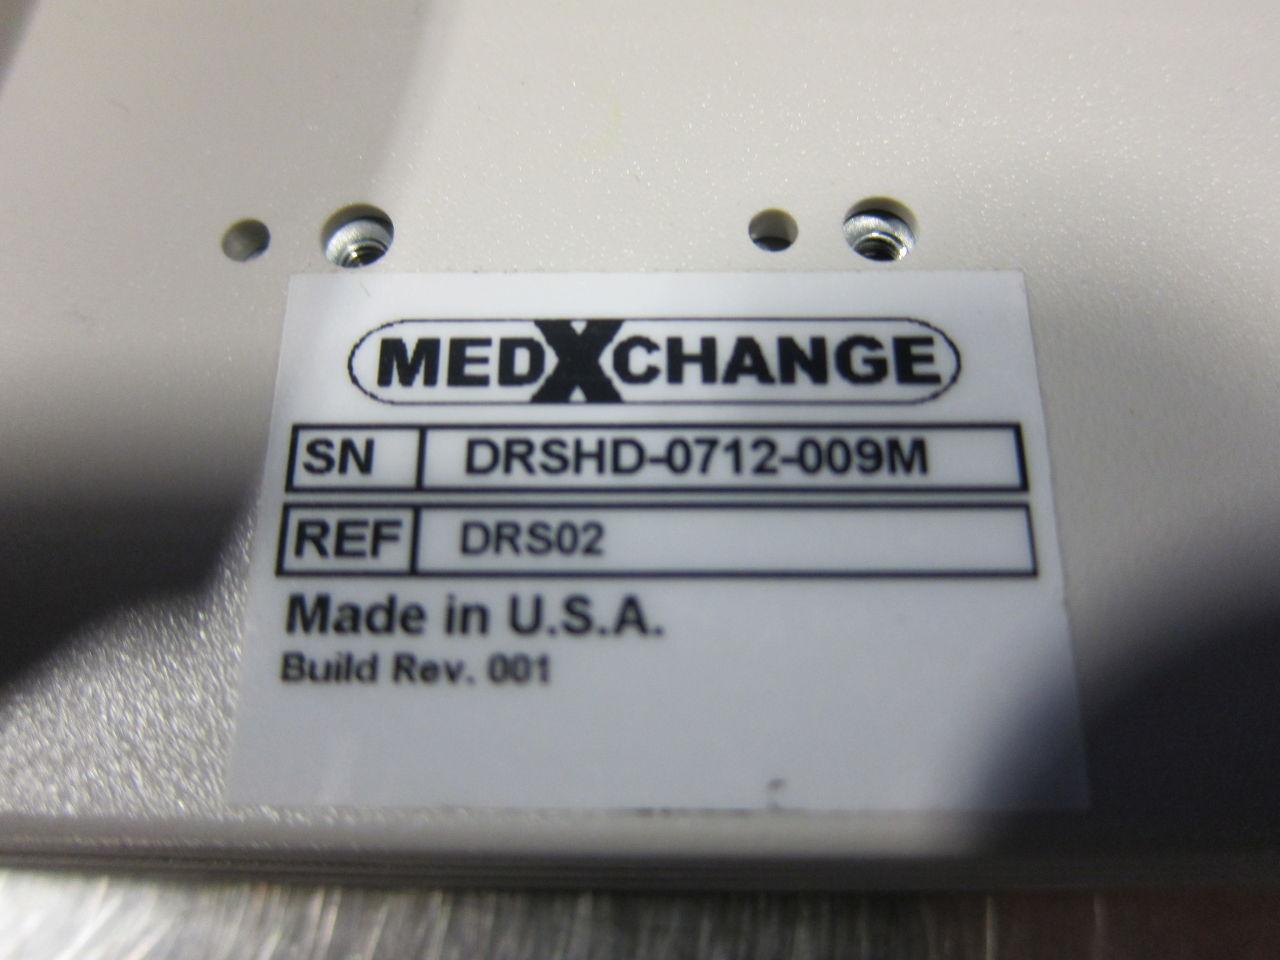 ELO/MEDXCHANGE DRS02 Displays - Lot of 5 Monitor